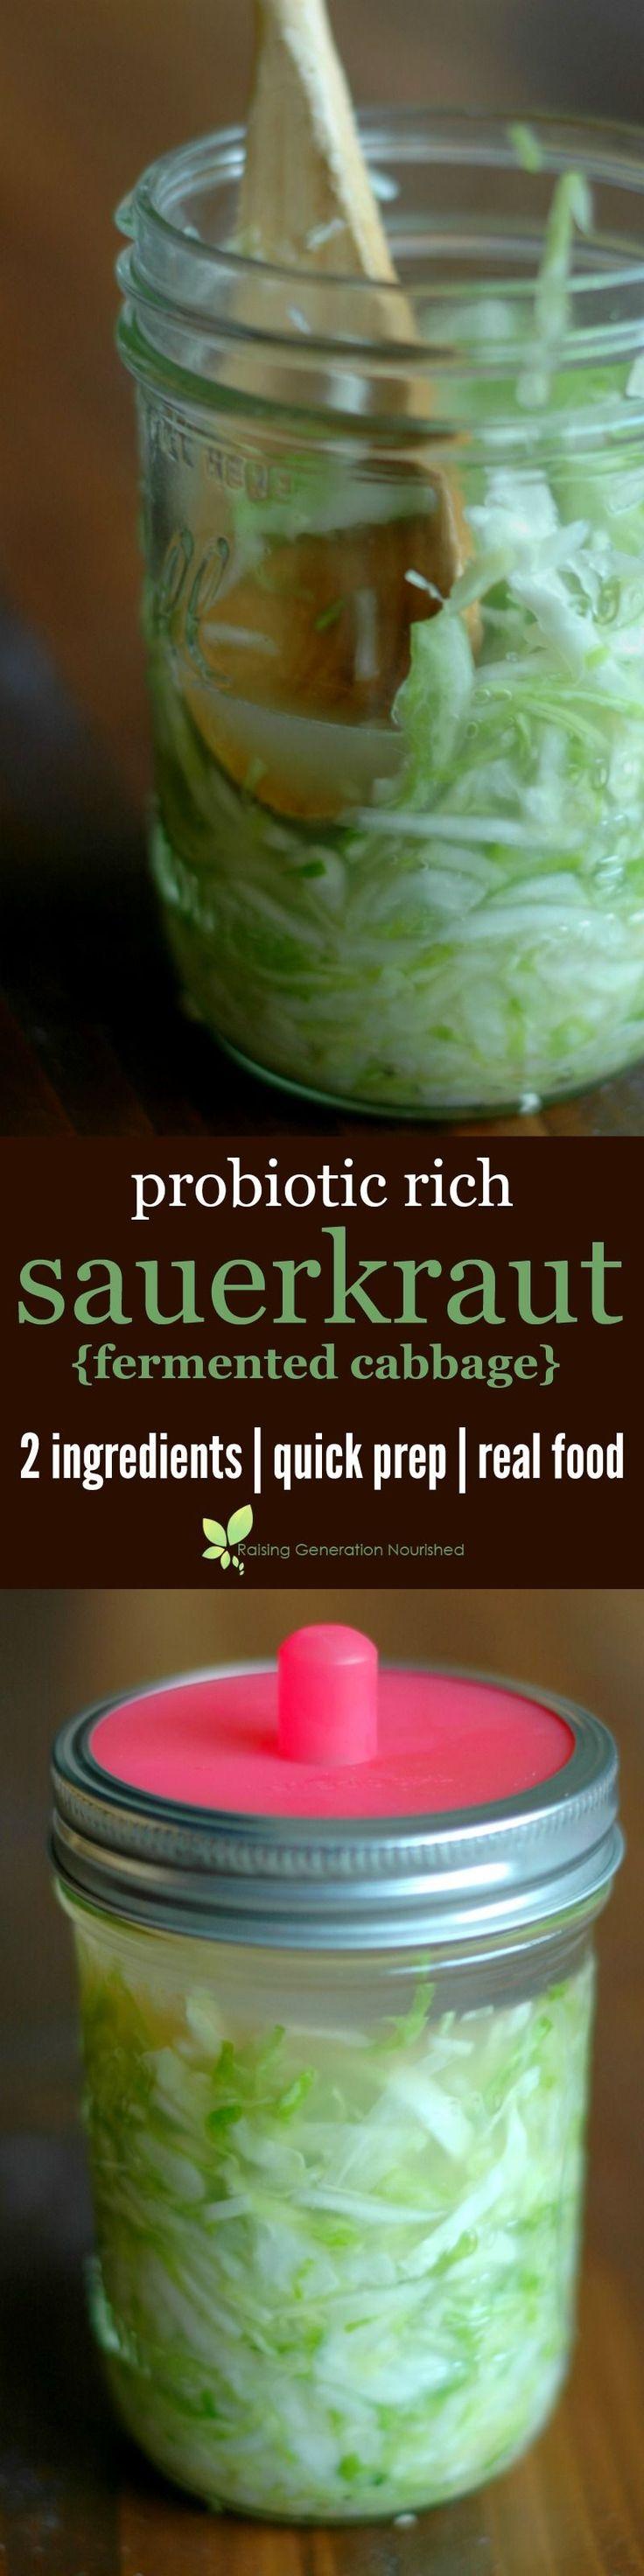 Probiotic Rich Sauerkraut {Fermented Cabbage} :: 2 Ingredients, Quick Prep, Real Food!